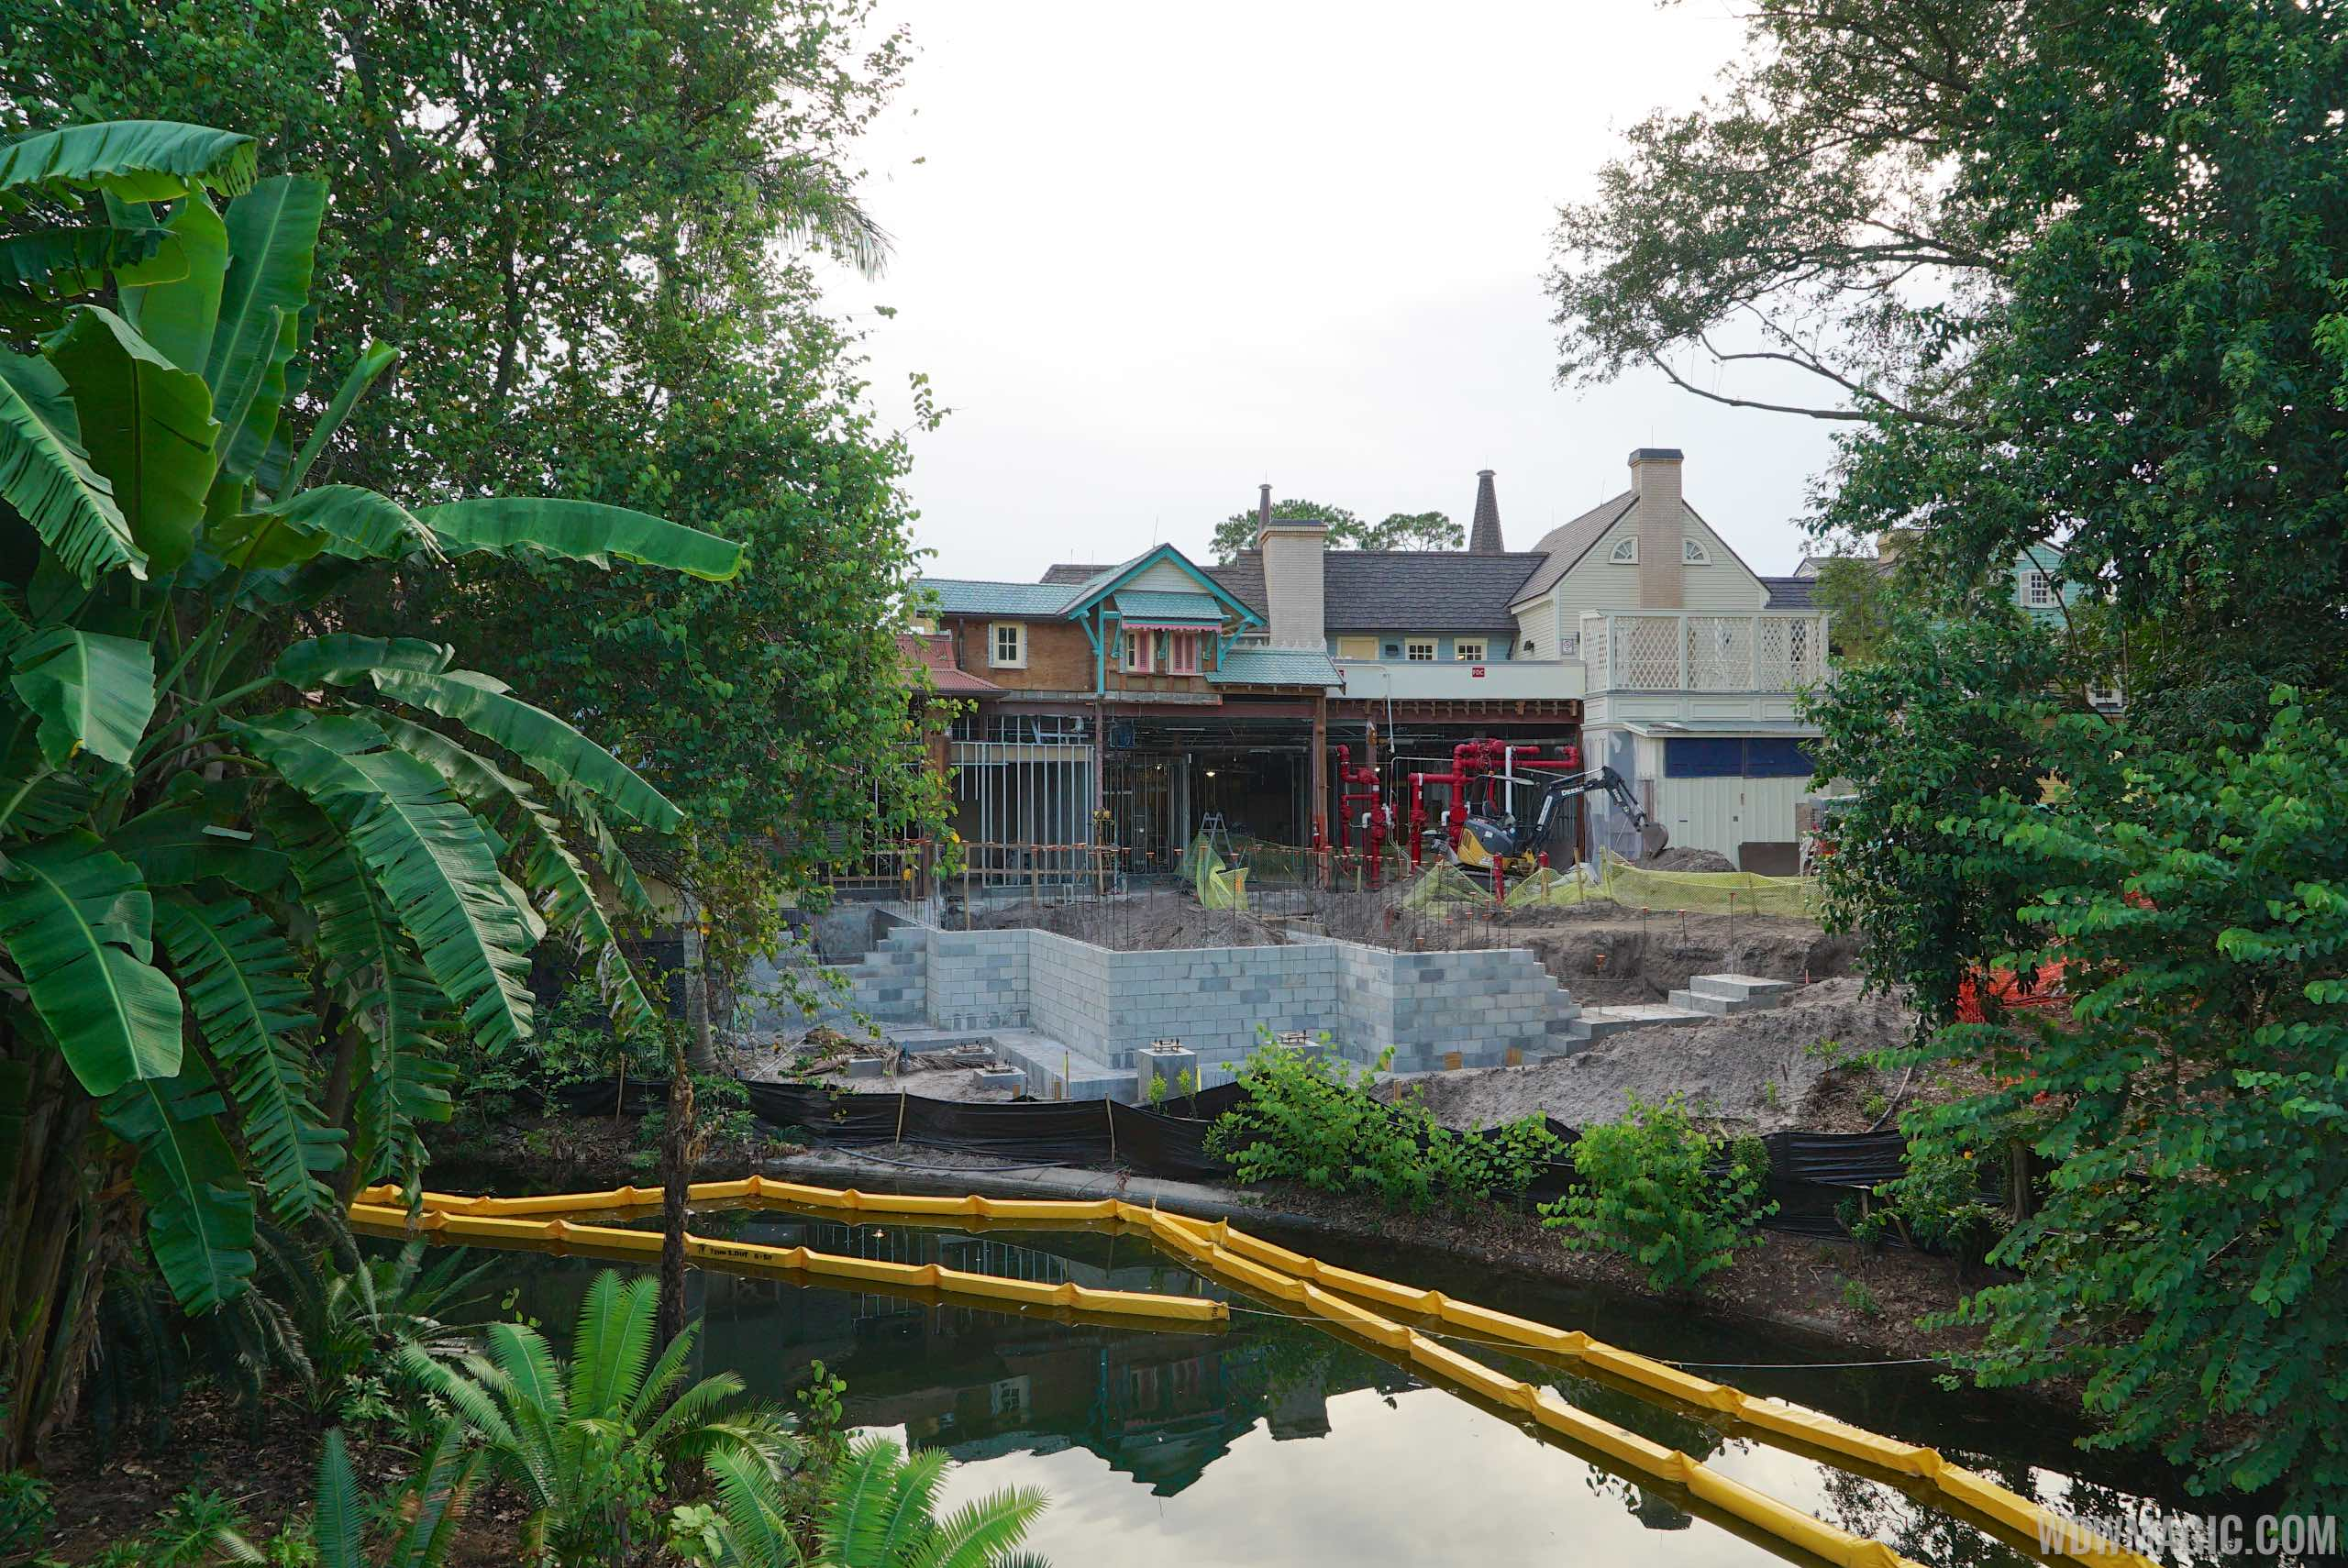 Adventureland Veranda construction